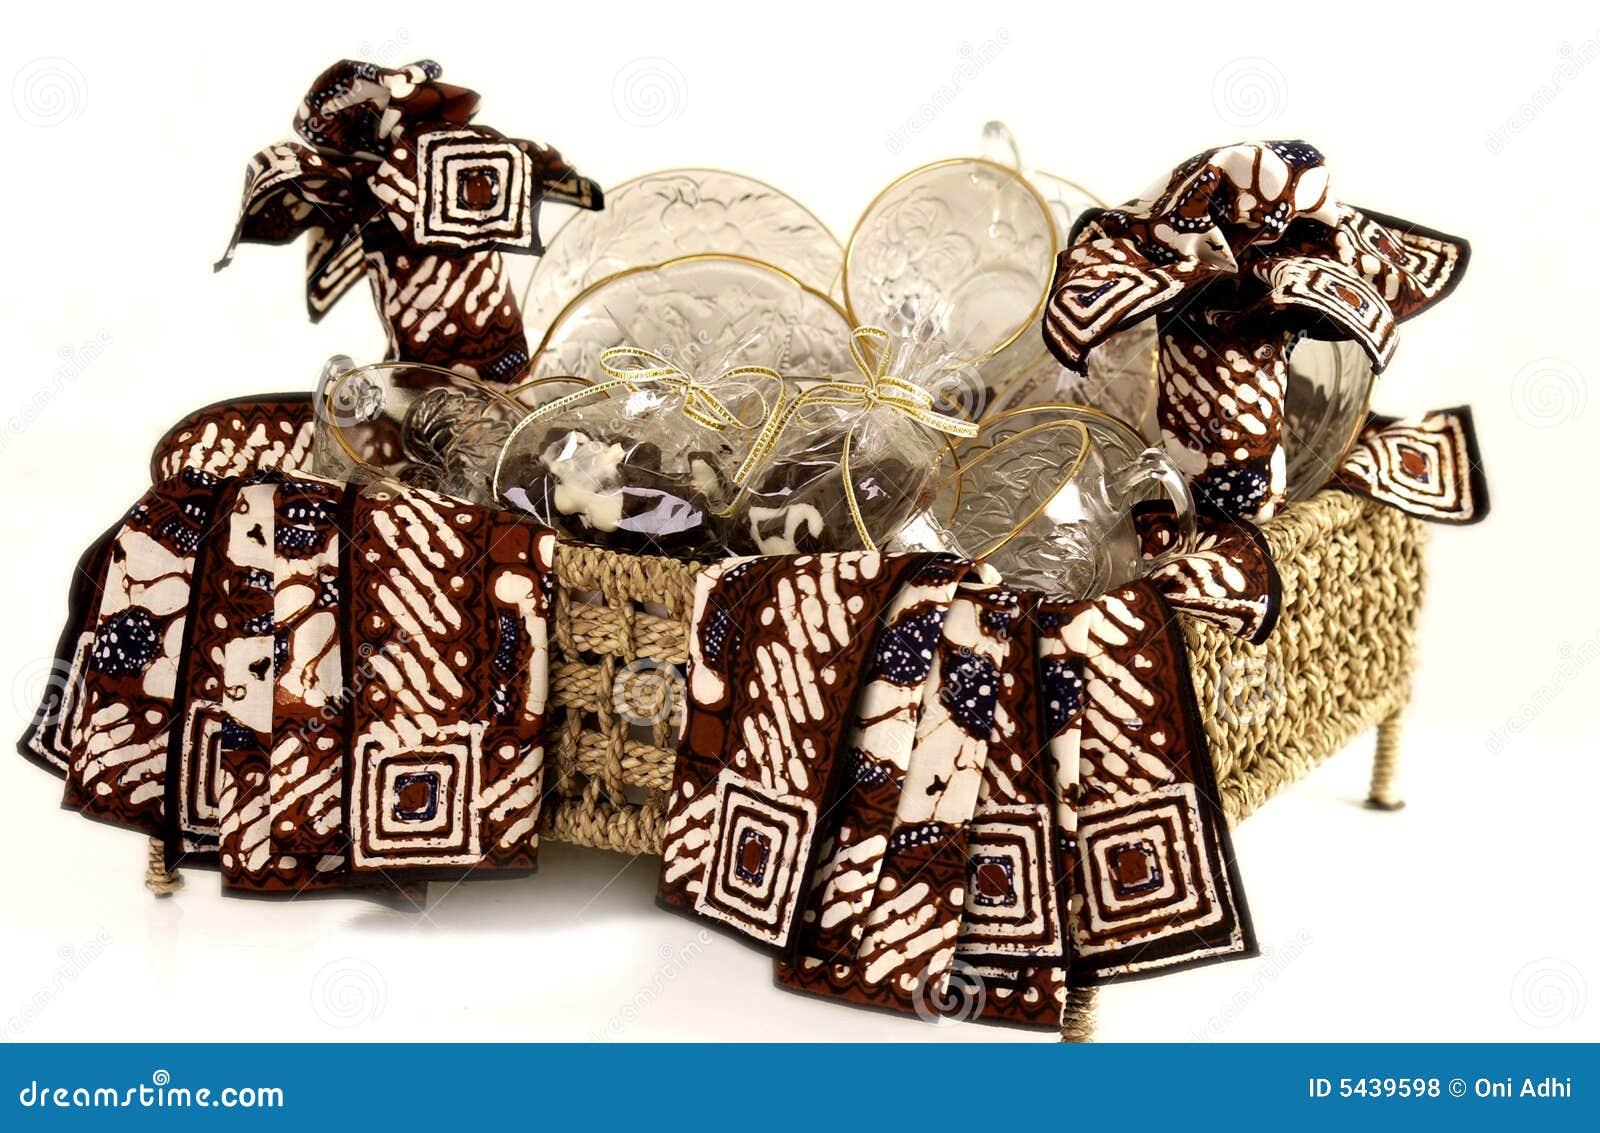 Download Javanese batik painting stock photo. Image of travelling - 5439598